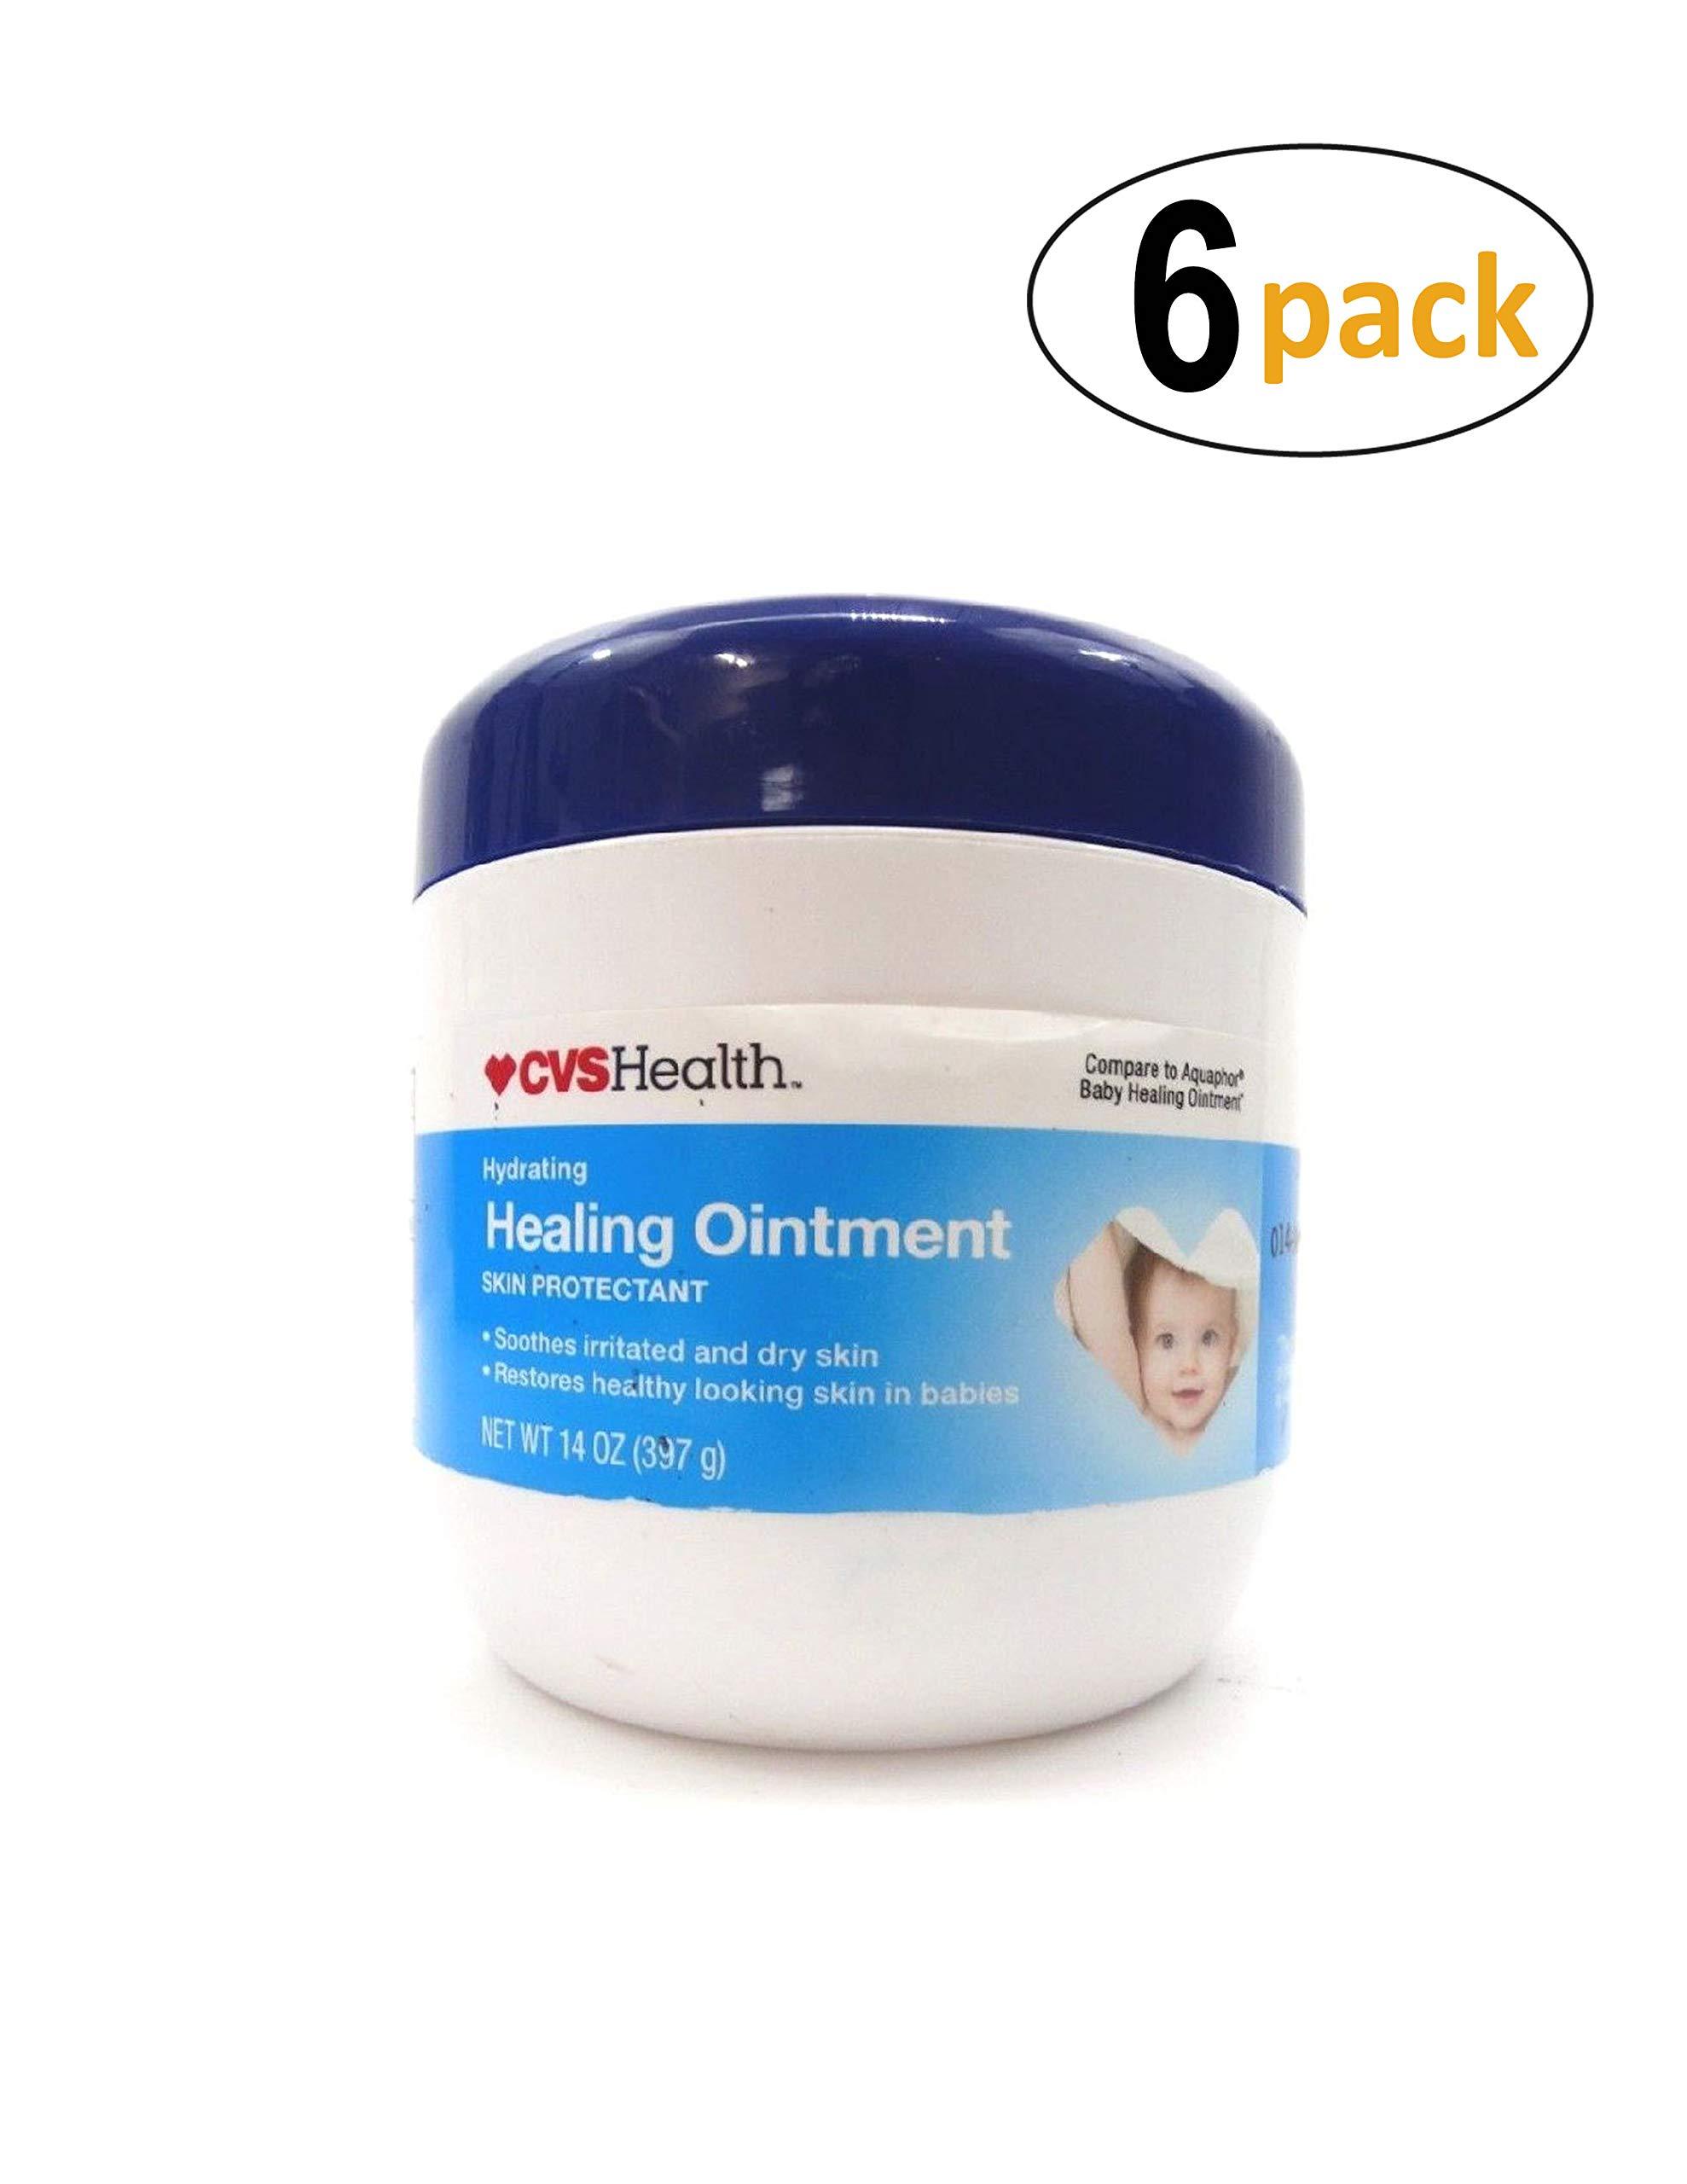 CVS Advanced Hydrating Baby Healing Ointment- 14 OZ (6 Pack) by CVS